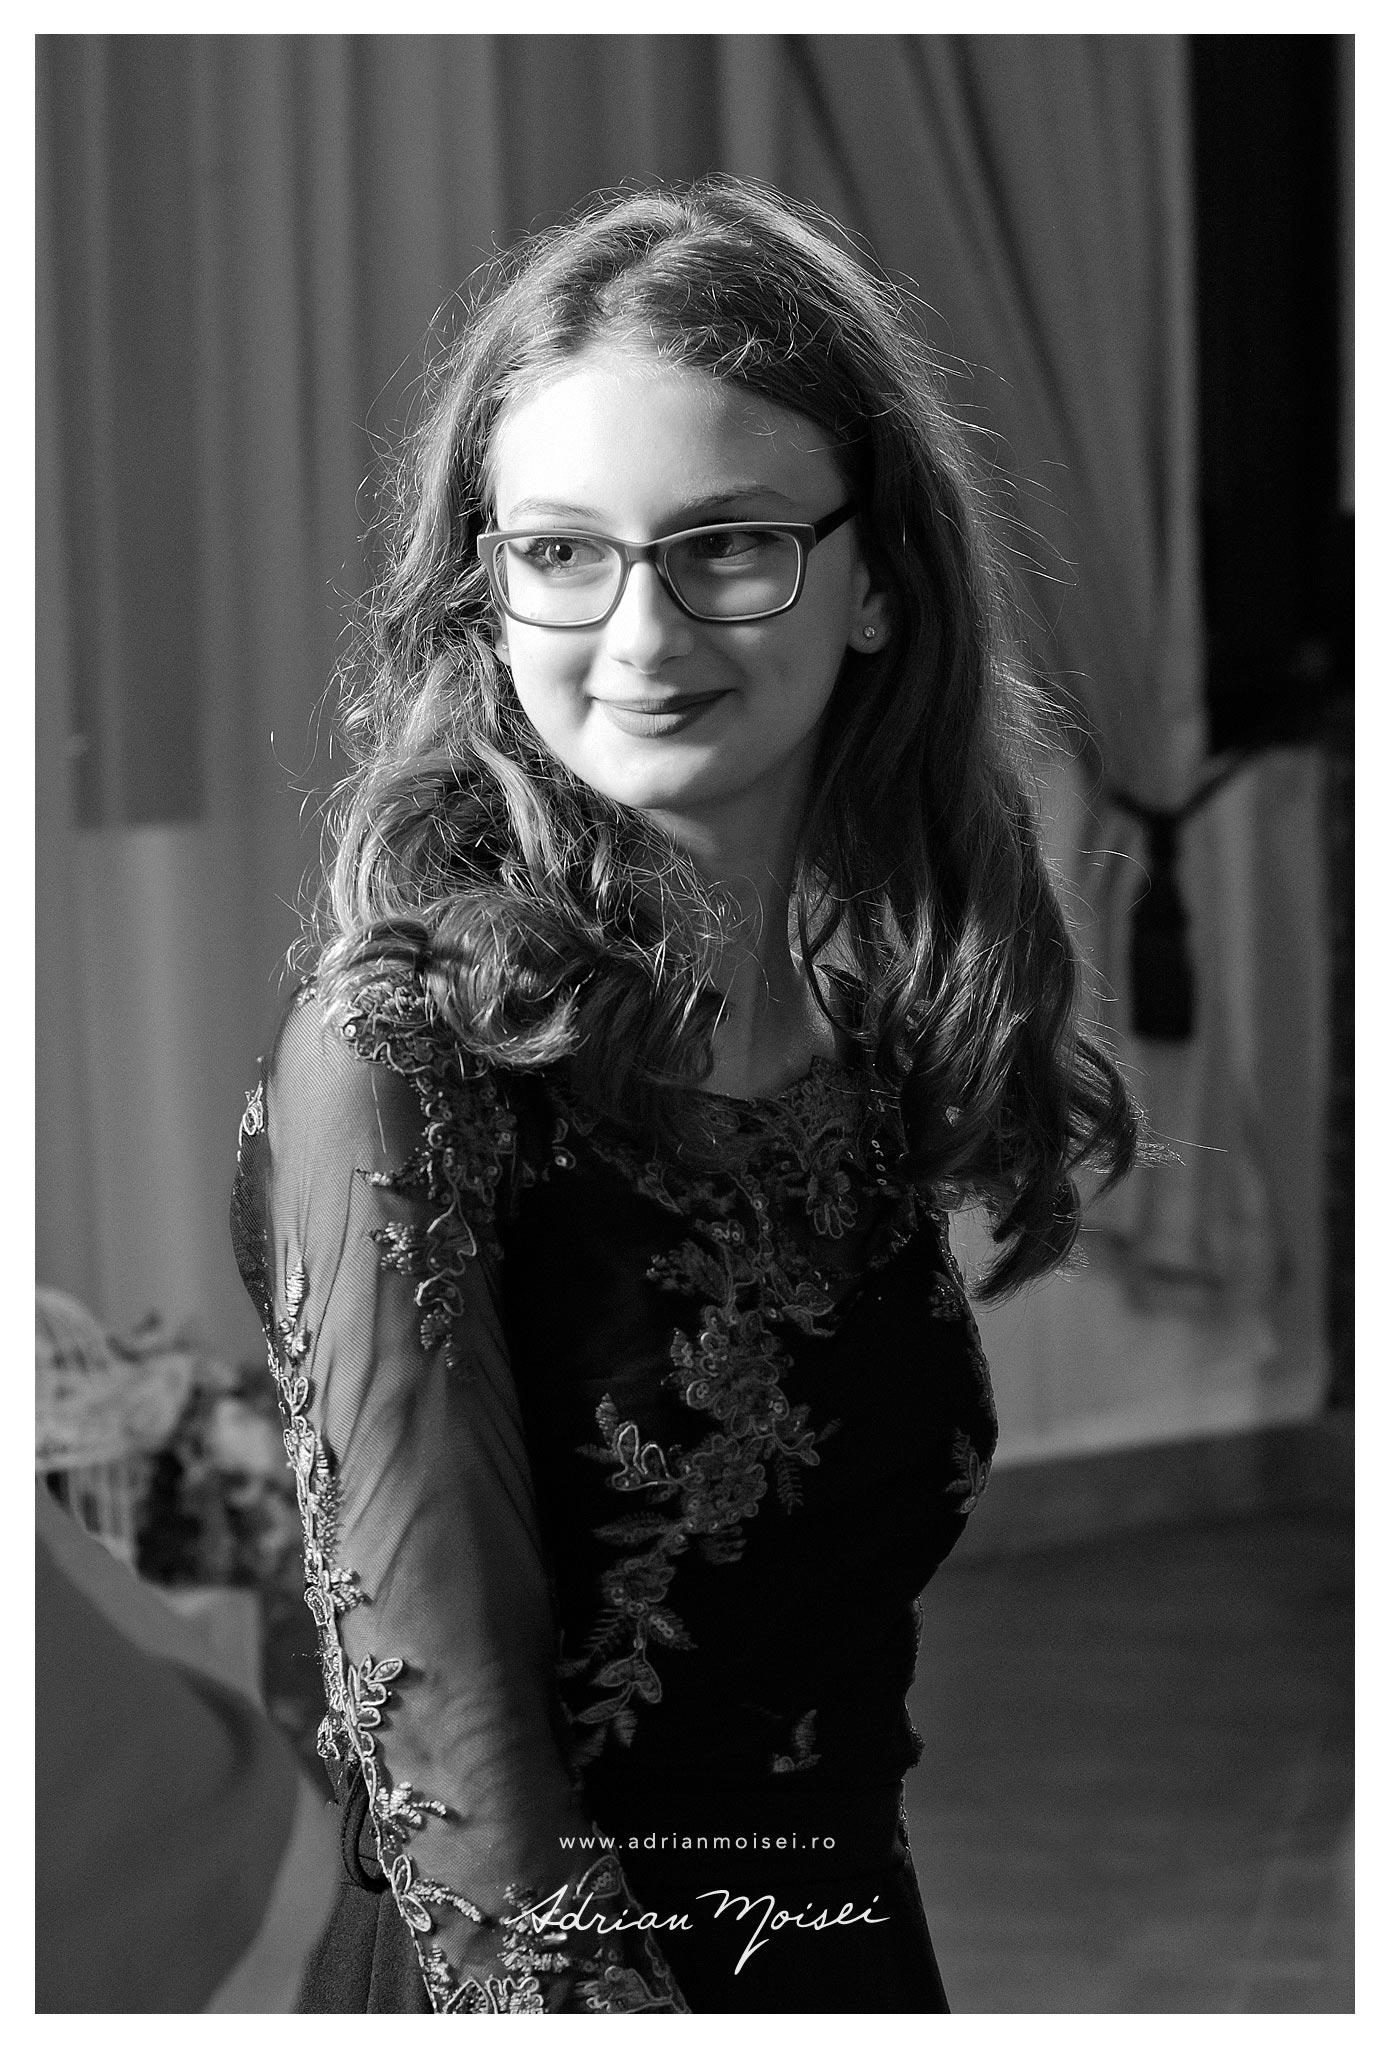 Portret de adolescenta, la petrecere, de Adrian Moisei, fotograf Iasi